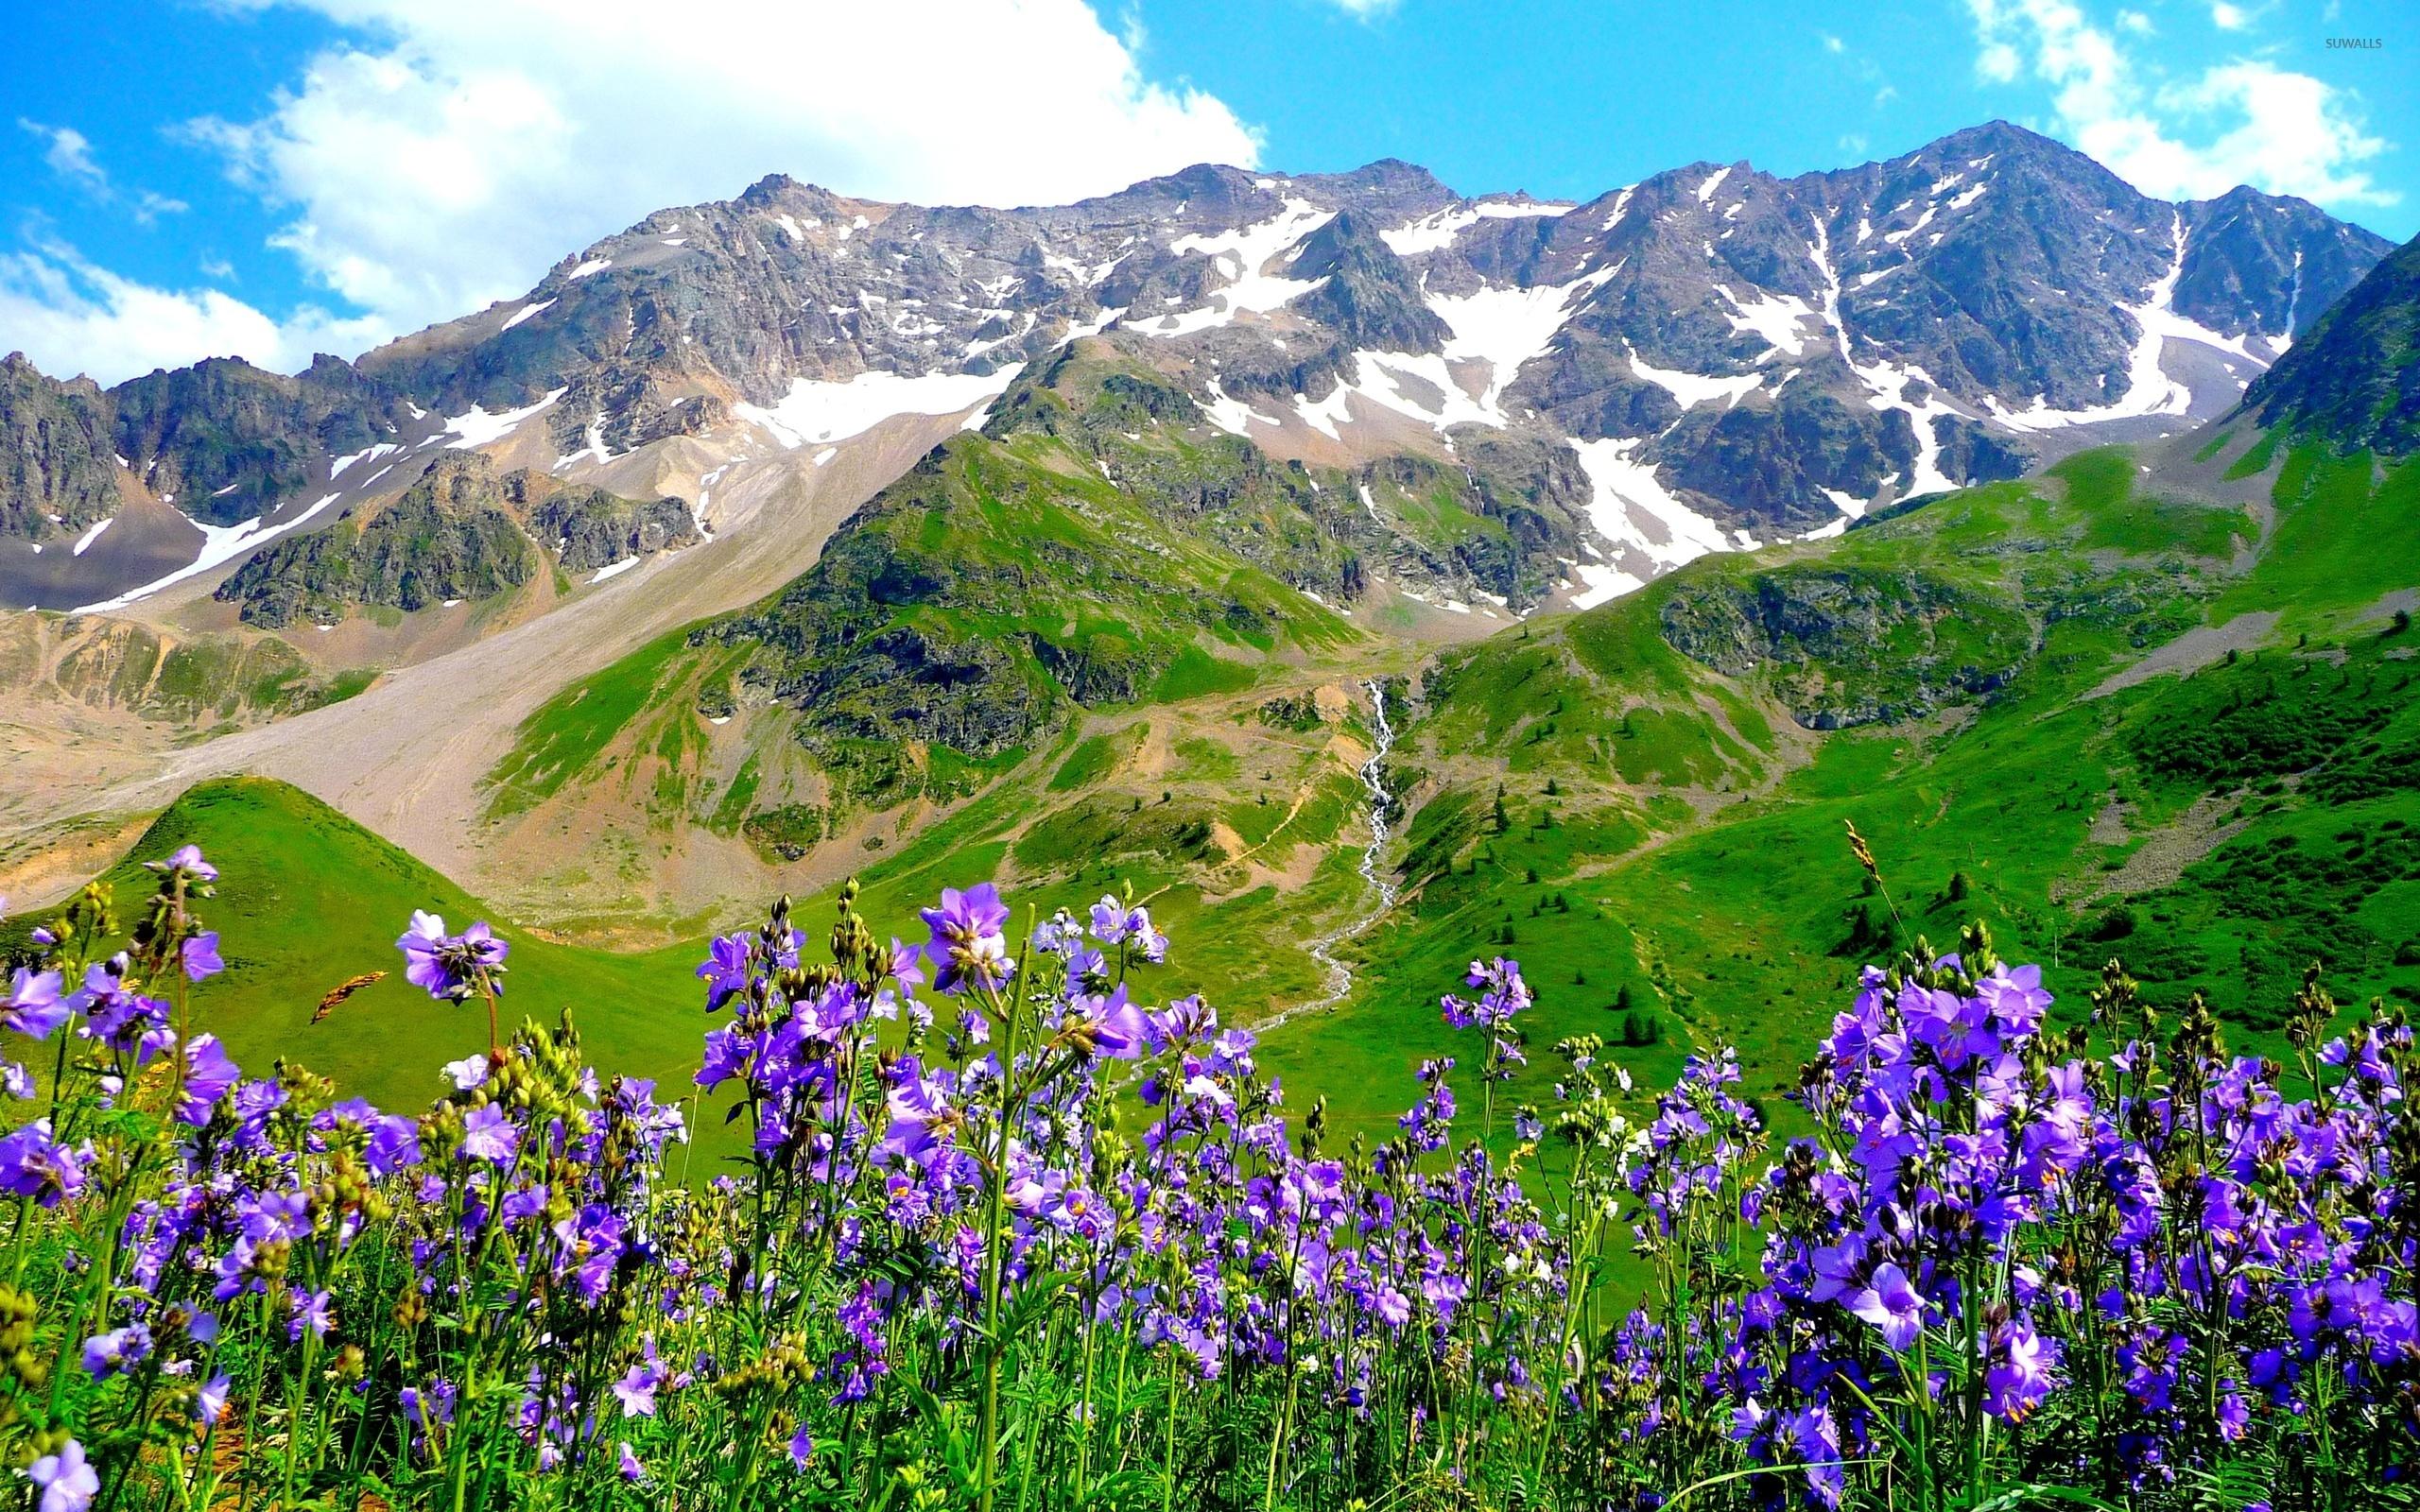 Good Wallpaper Mountain Flower - purple-mountain-flowers-41937-2560x1600  Graphic_93861.jpg